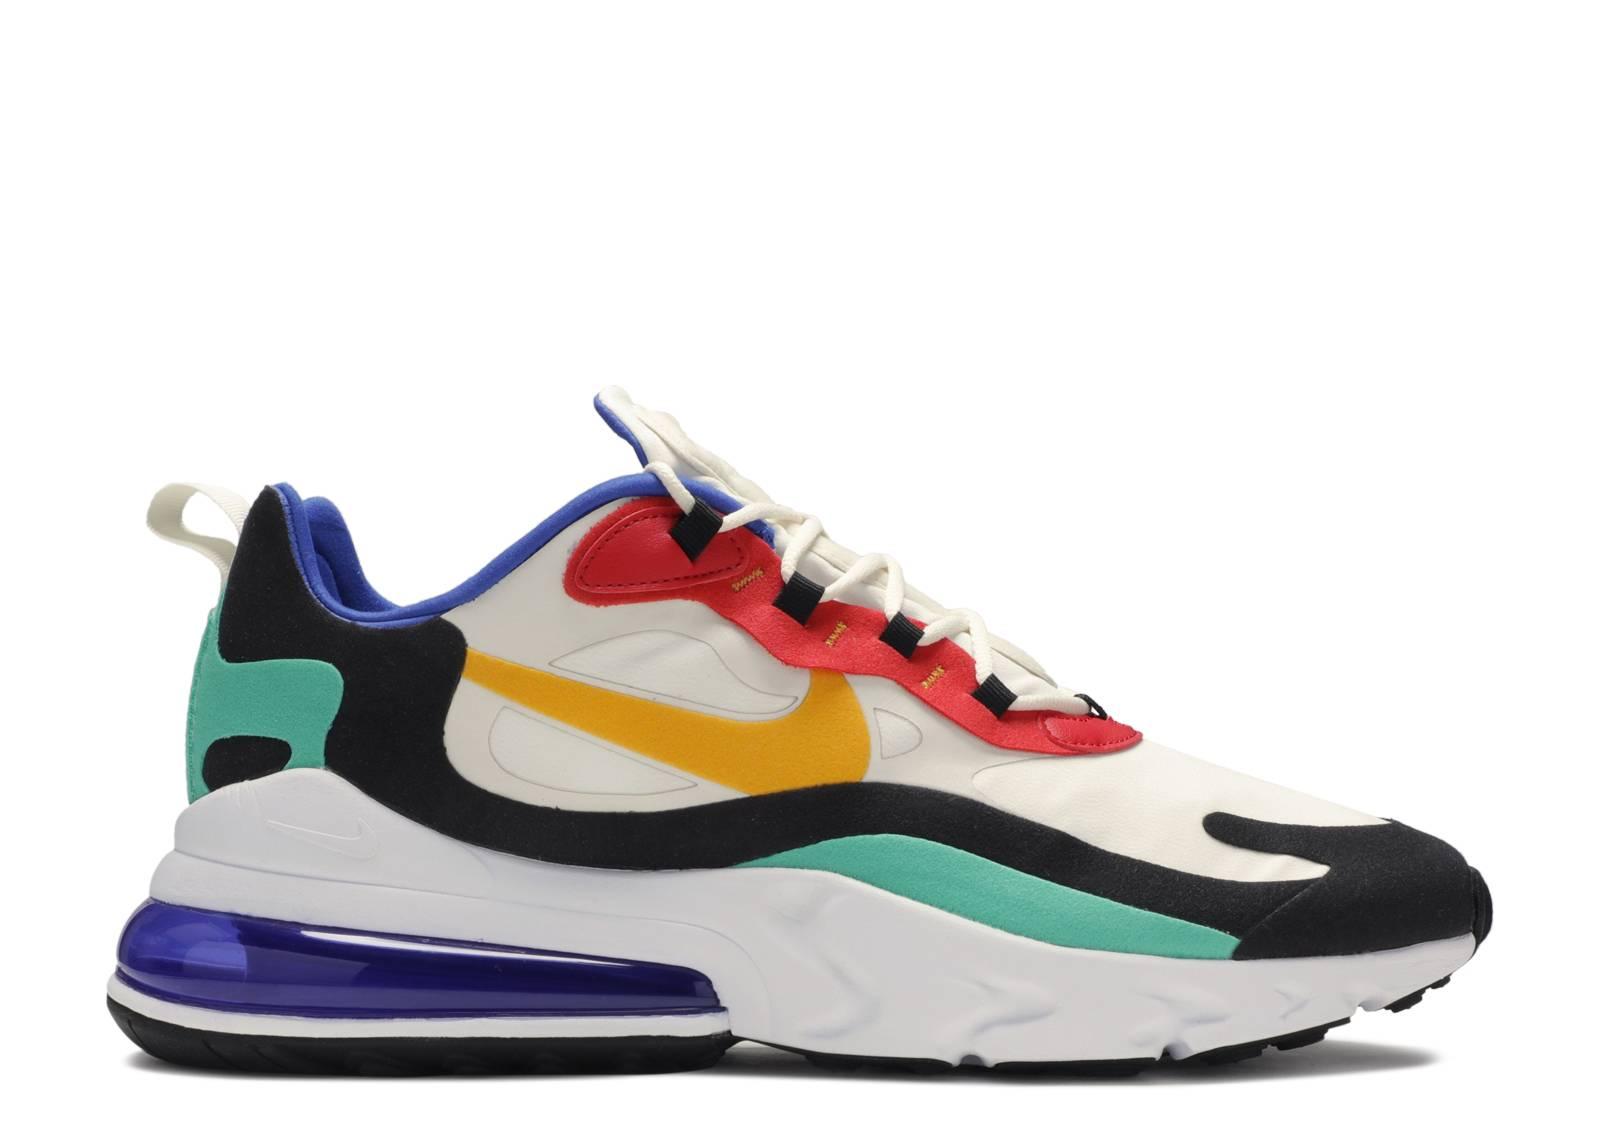 Nike Air Max 270 Men's & Women's Shoes | Flight Club